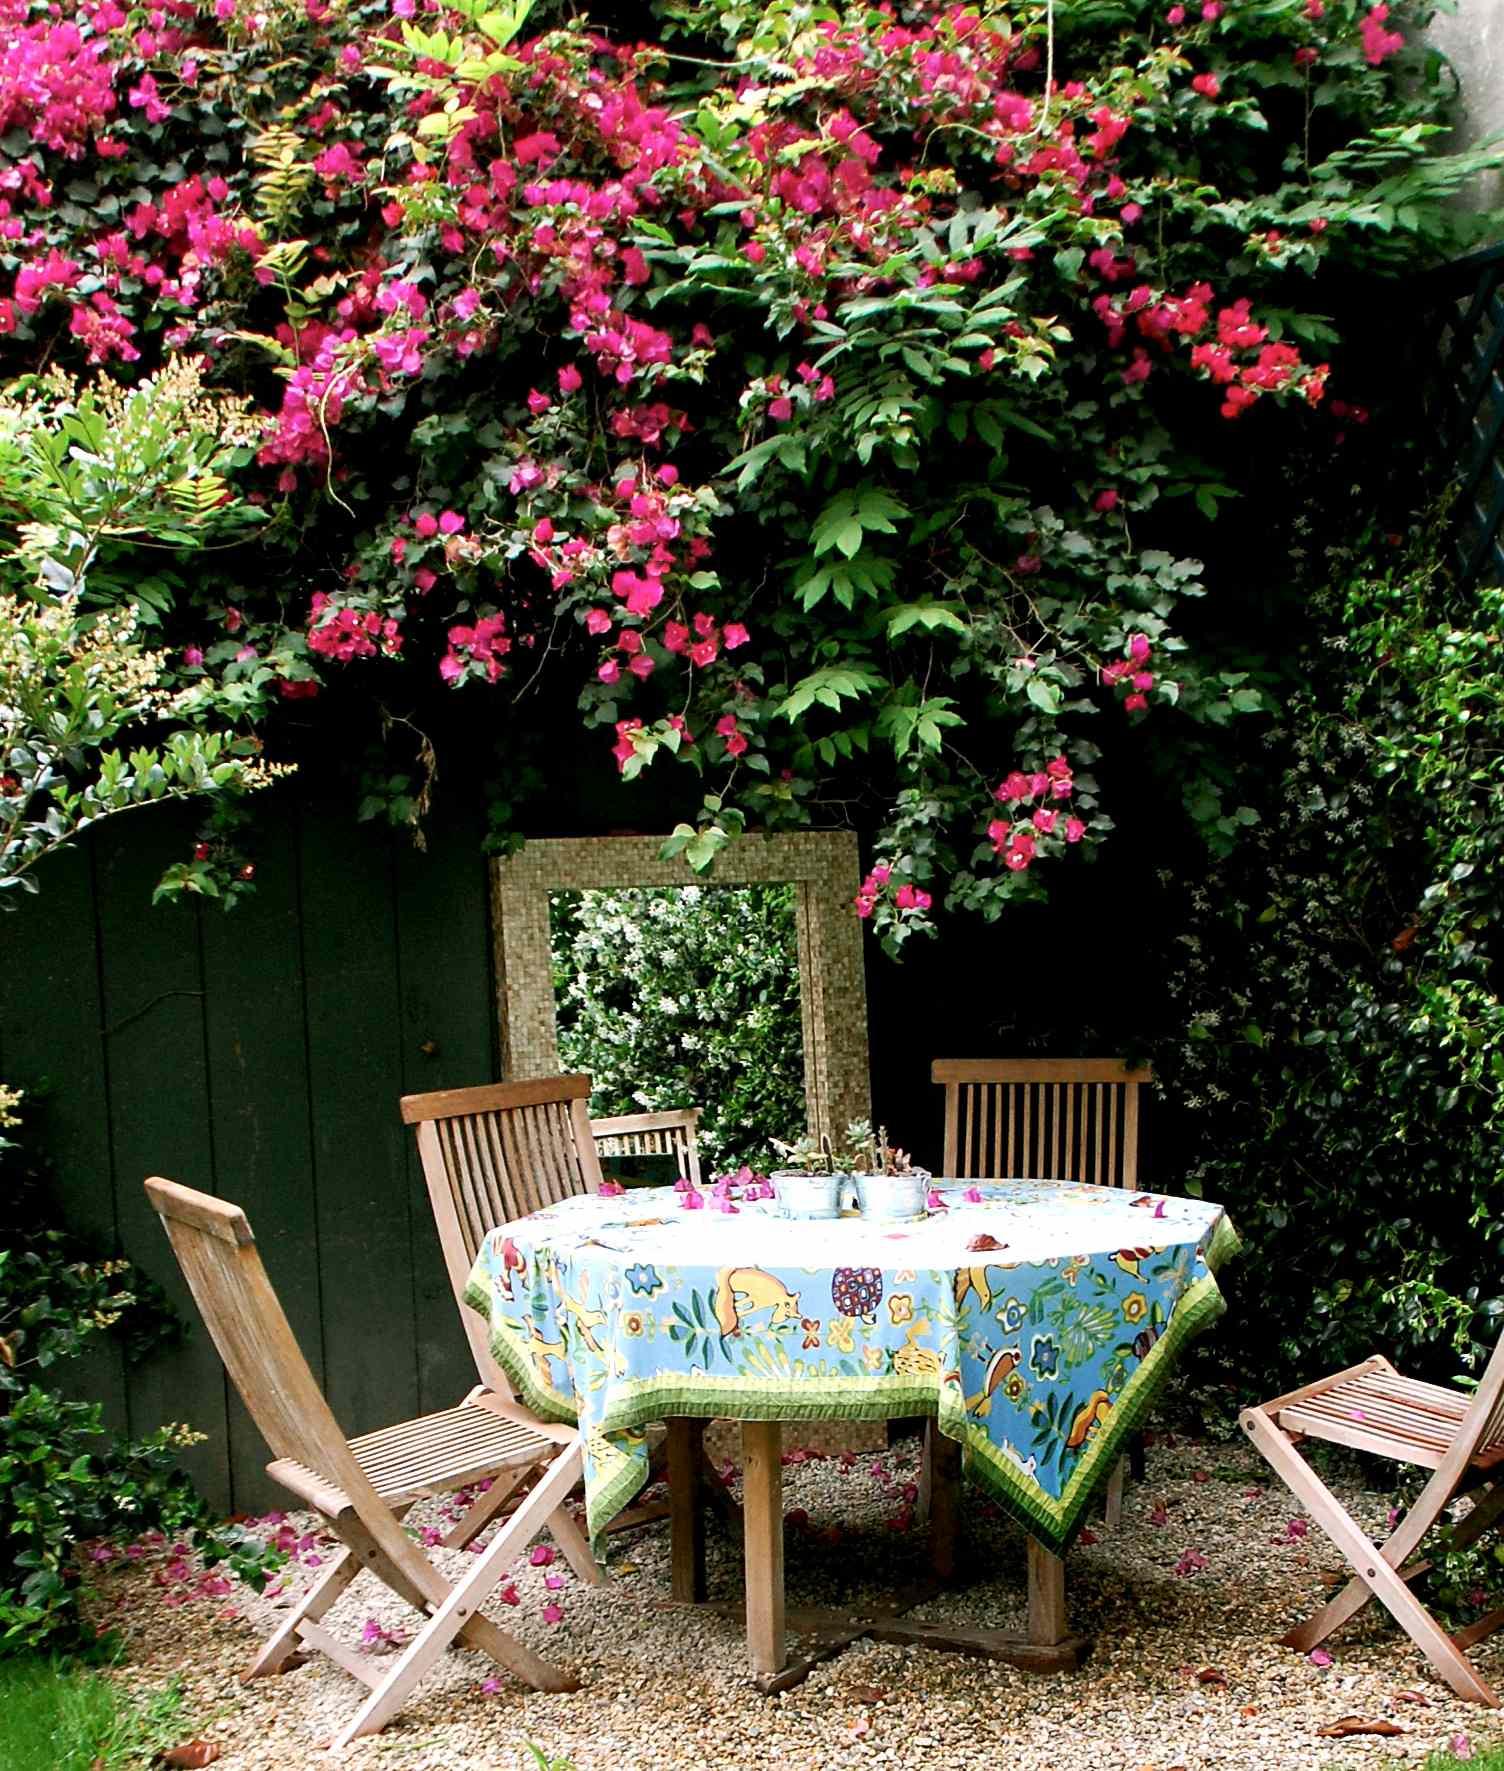 Terraza veraniega con flores rosas